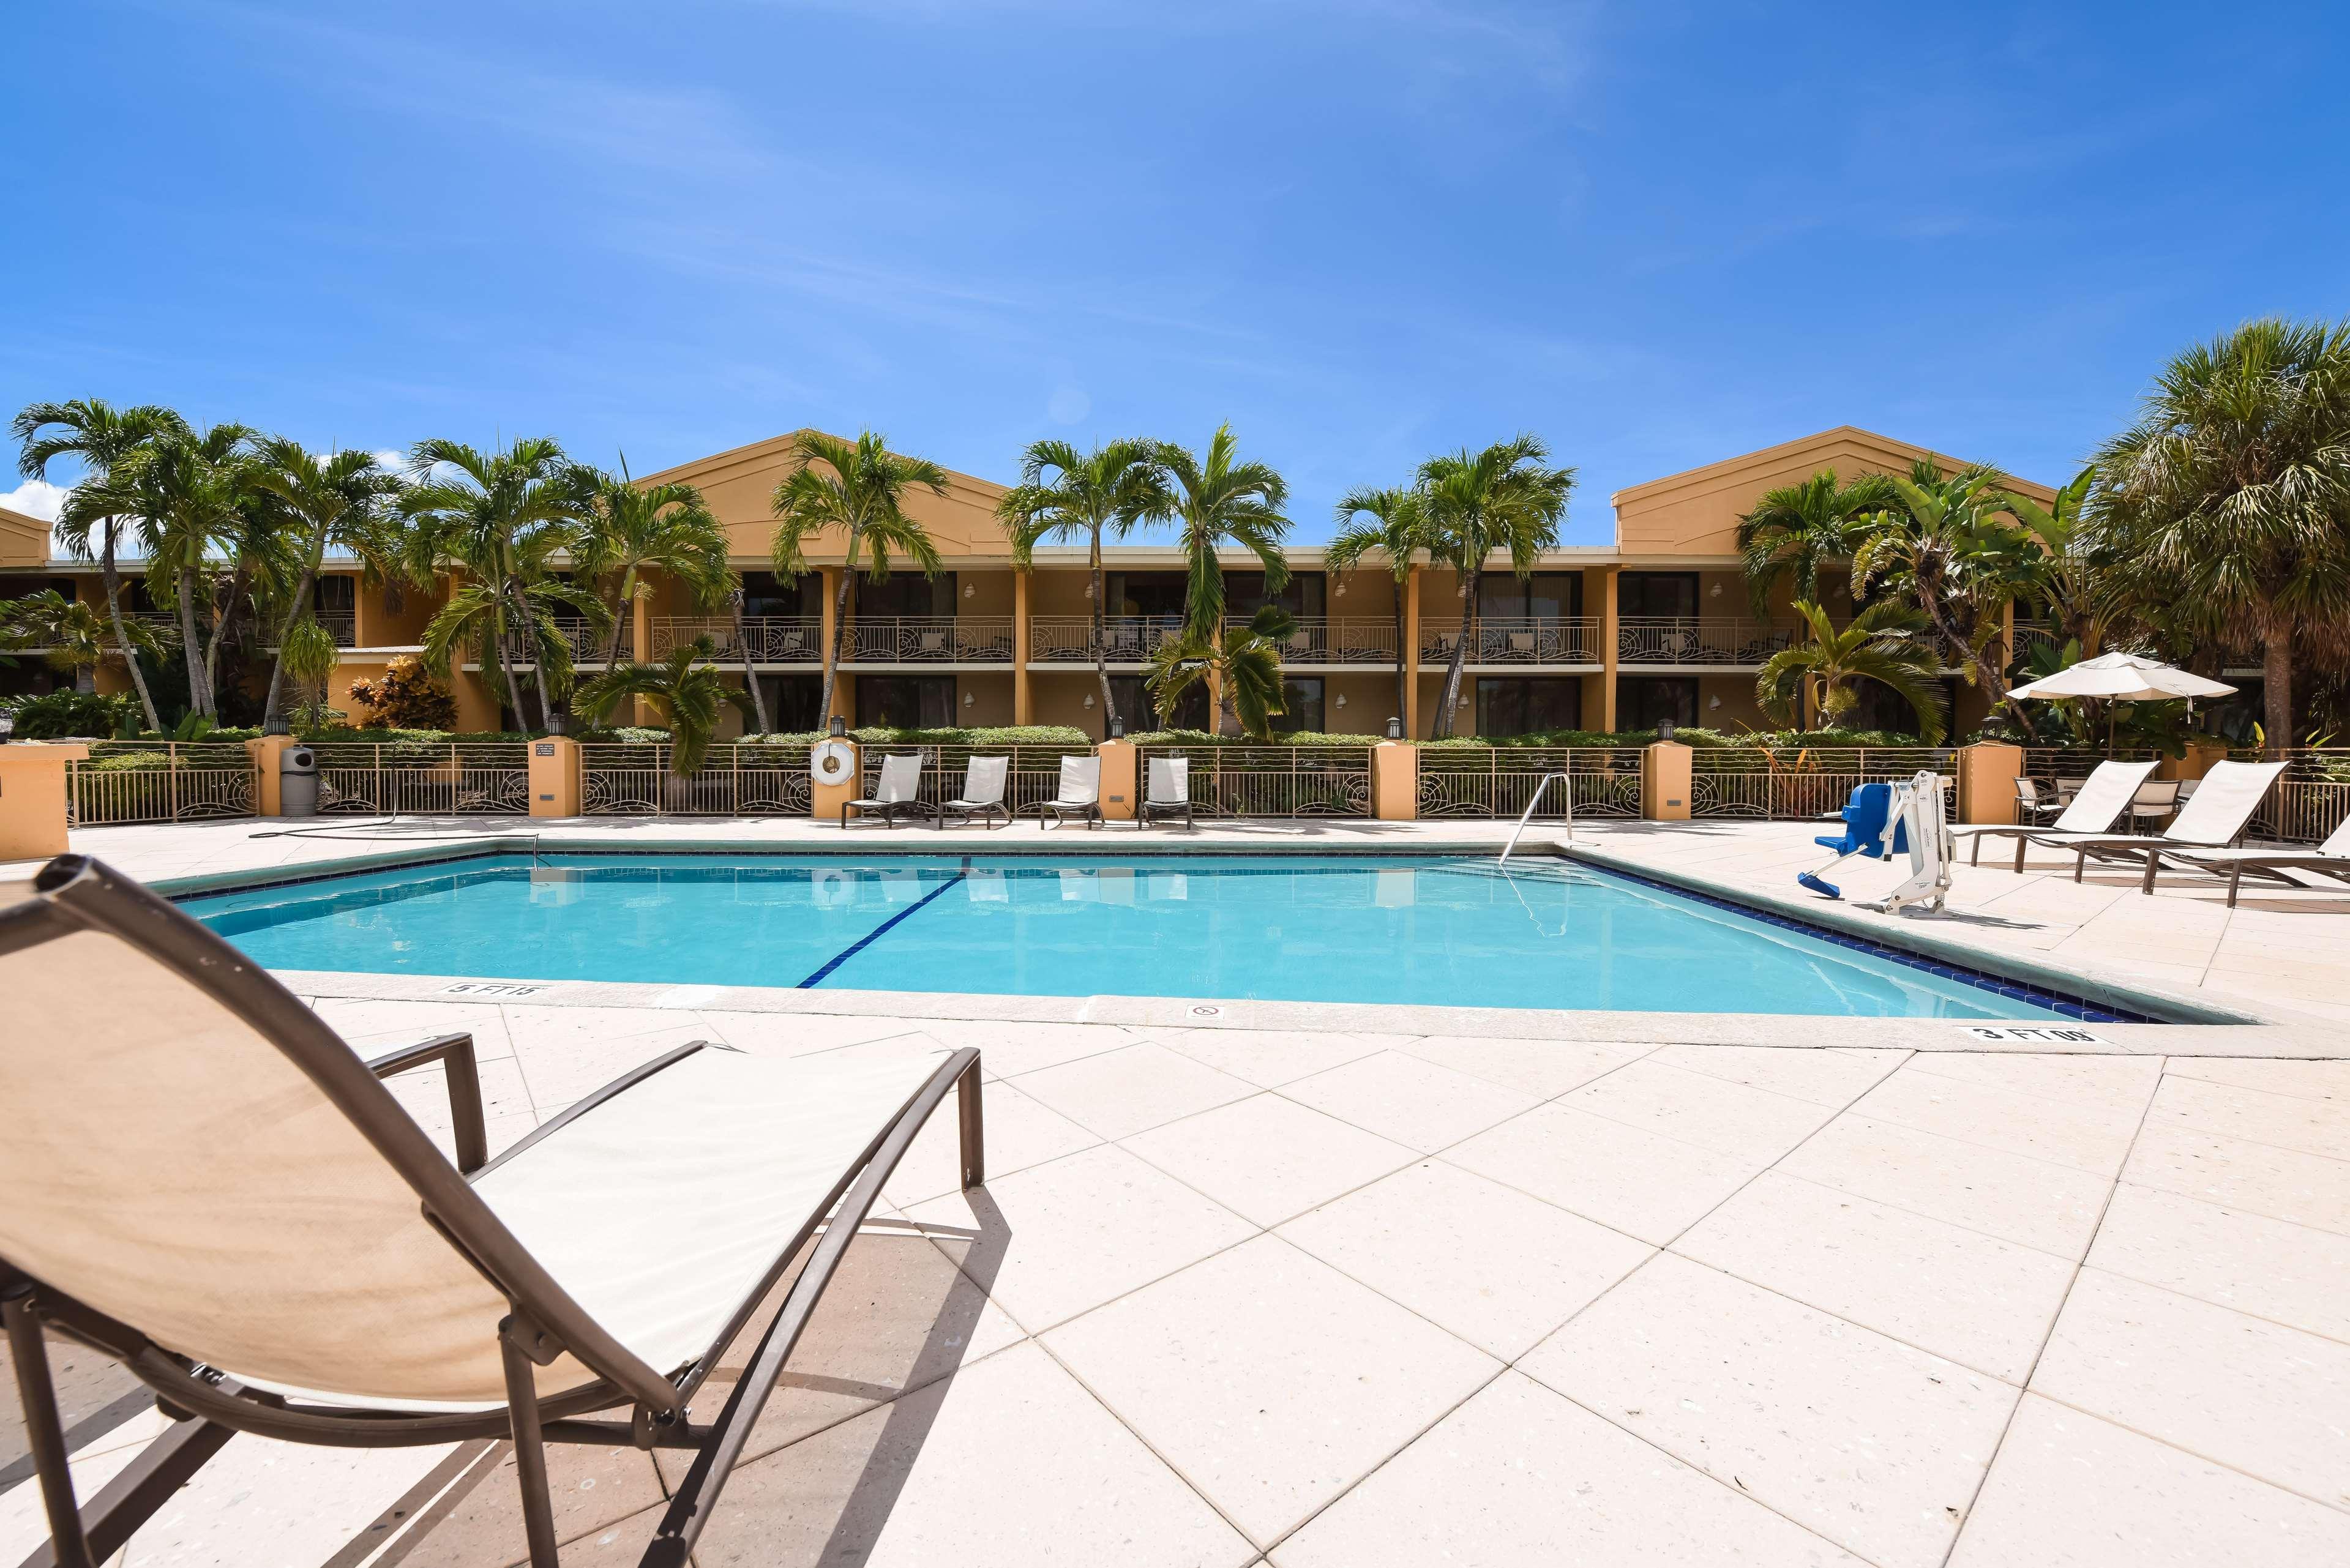 Hampton Inn Key Largo, FL image 11